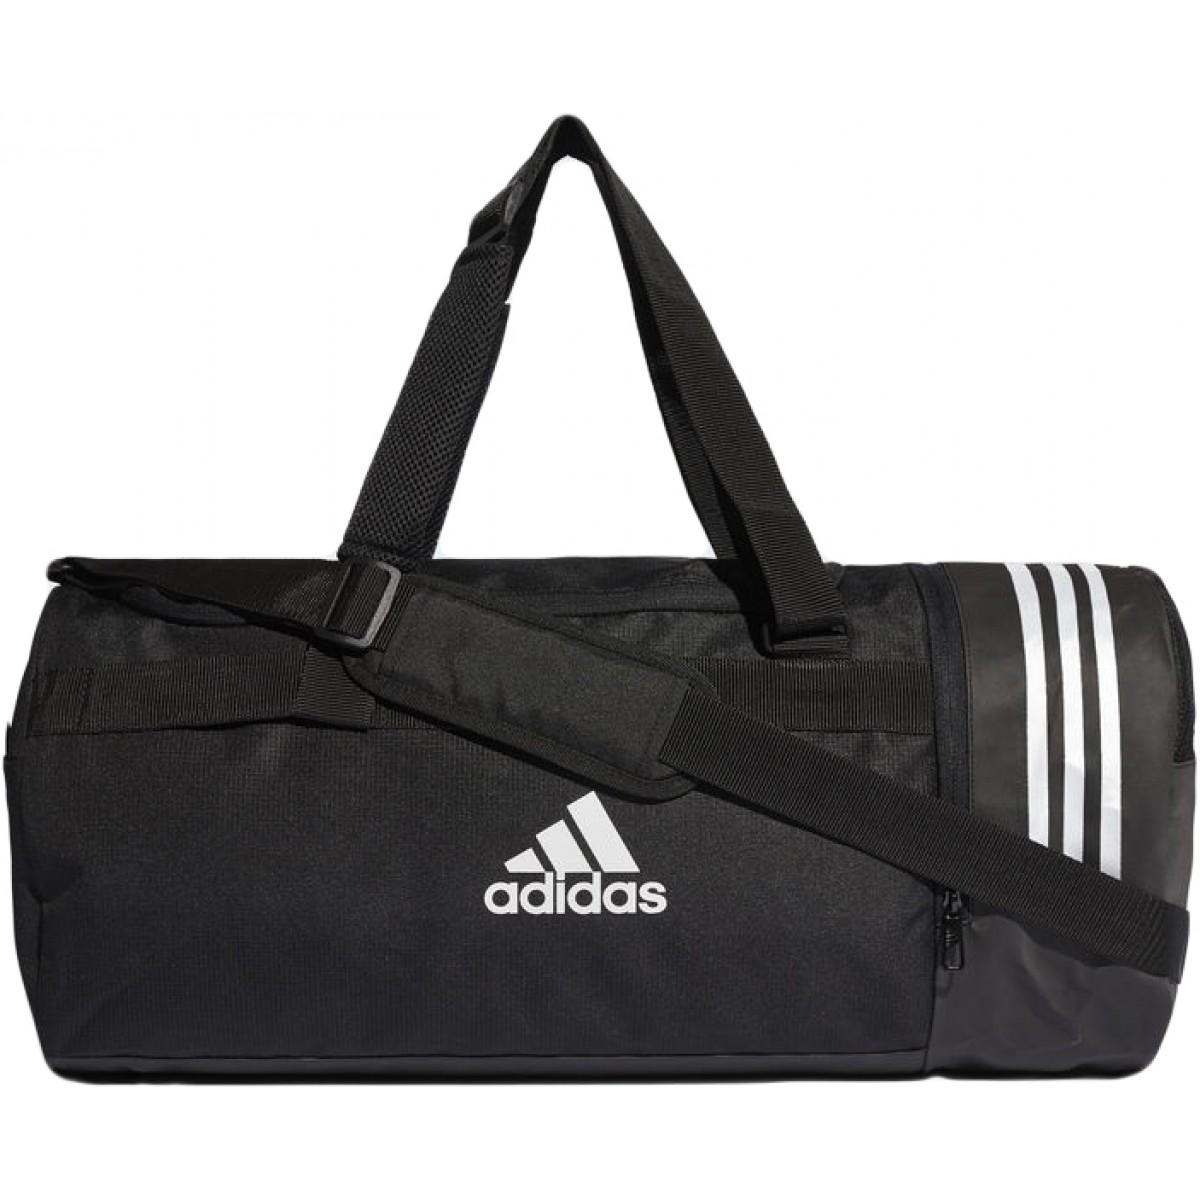 Sport Sac De Adidas SacsTennispro Athlete UMLGpqzSV